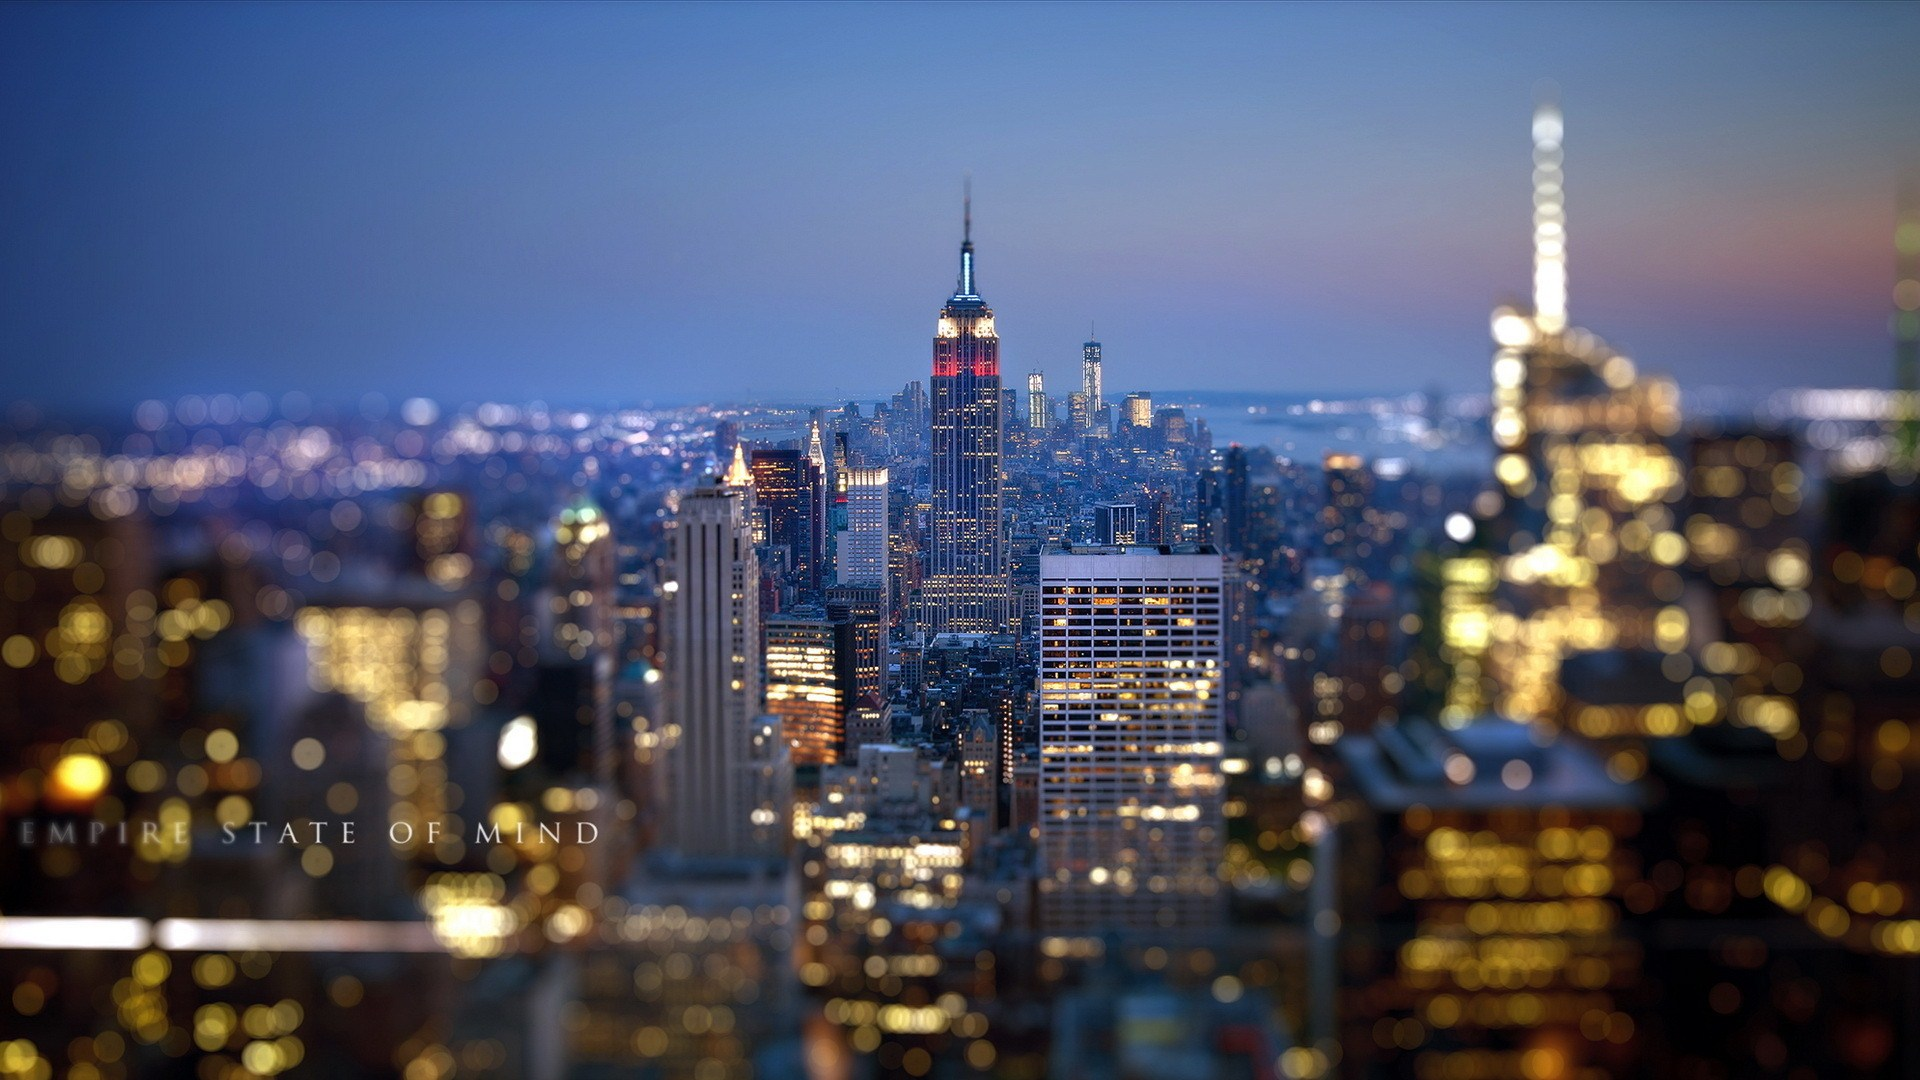 New York City Street HD Wallpaper 1920x1080